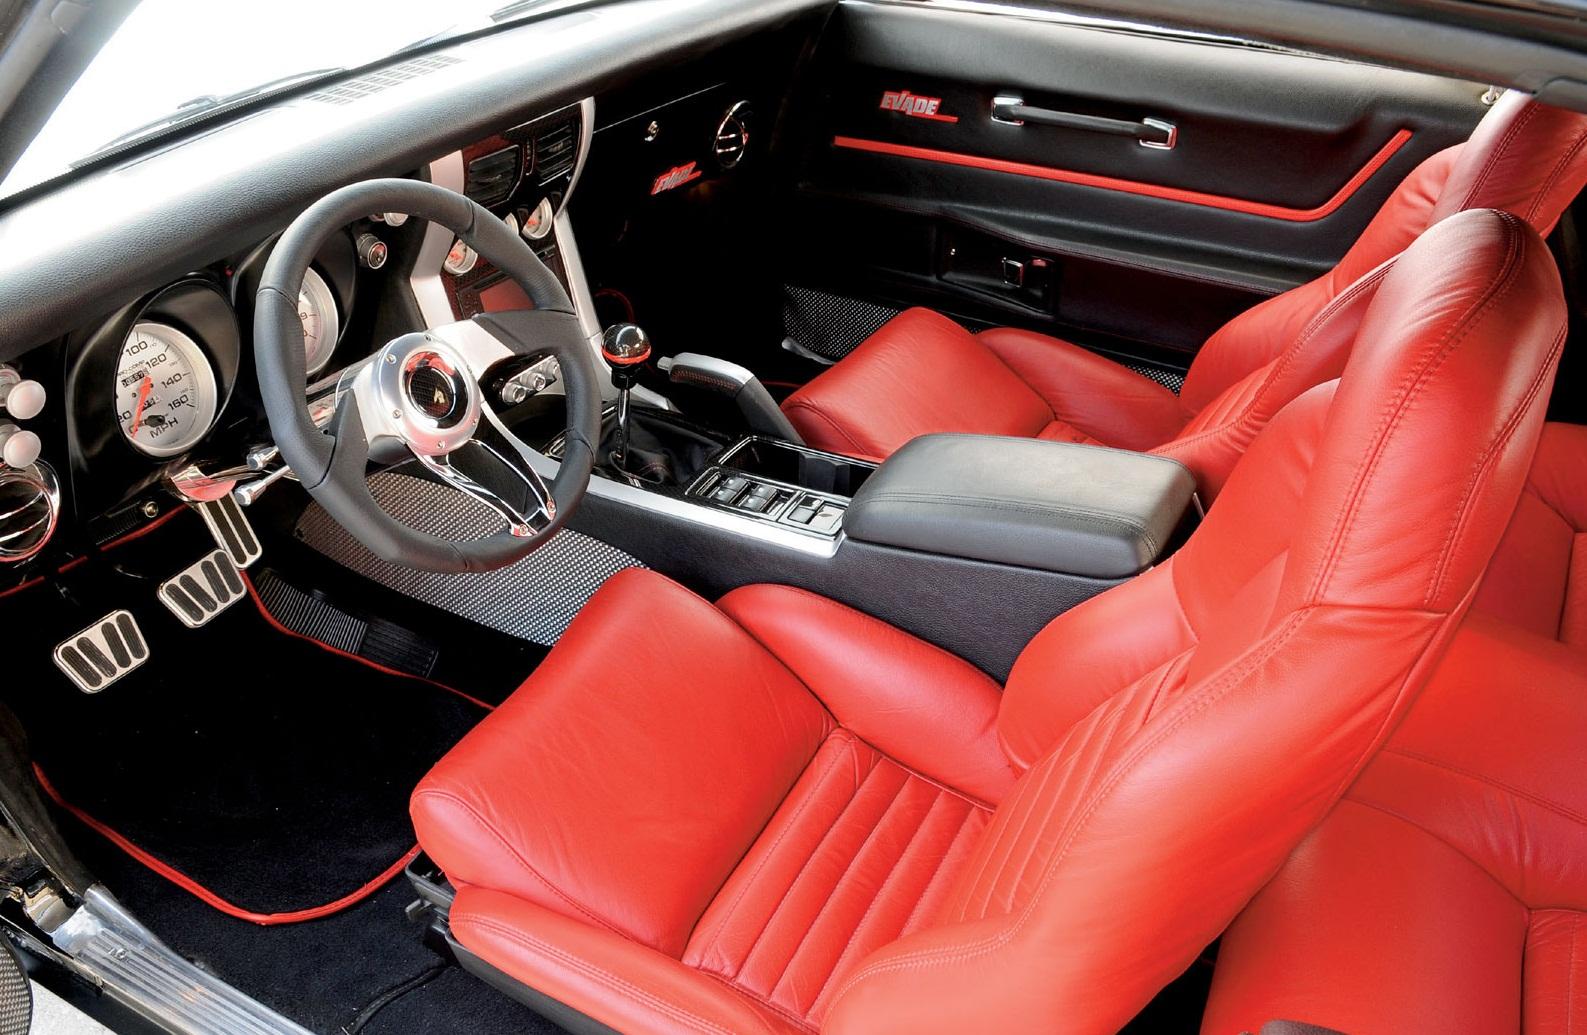 1968 Chevy Camaro Muscle Car Interior